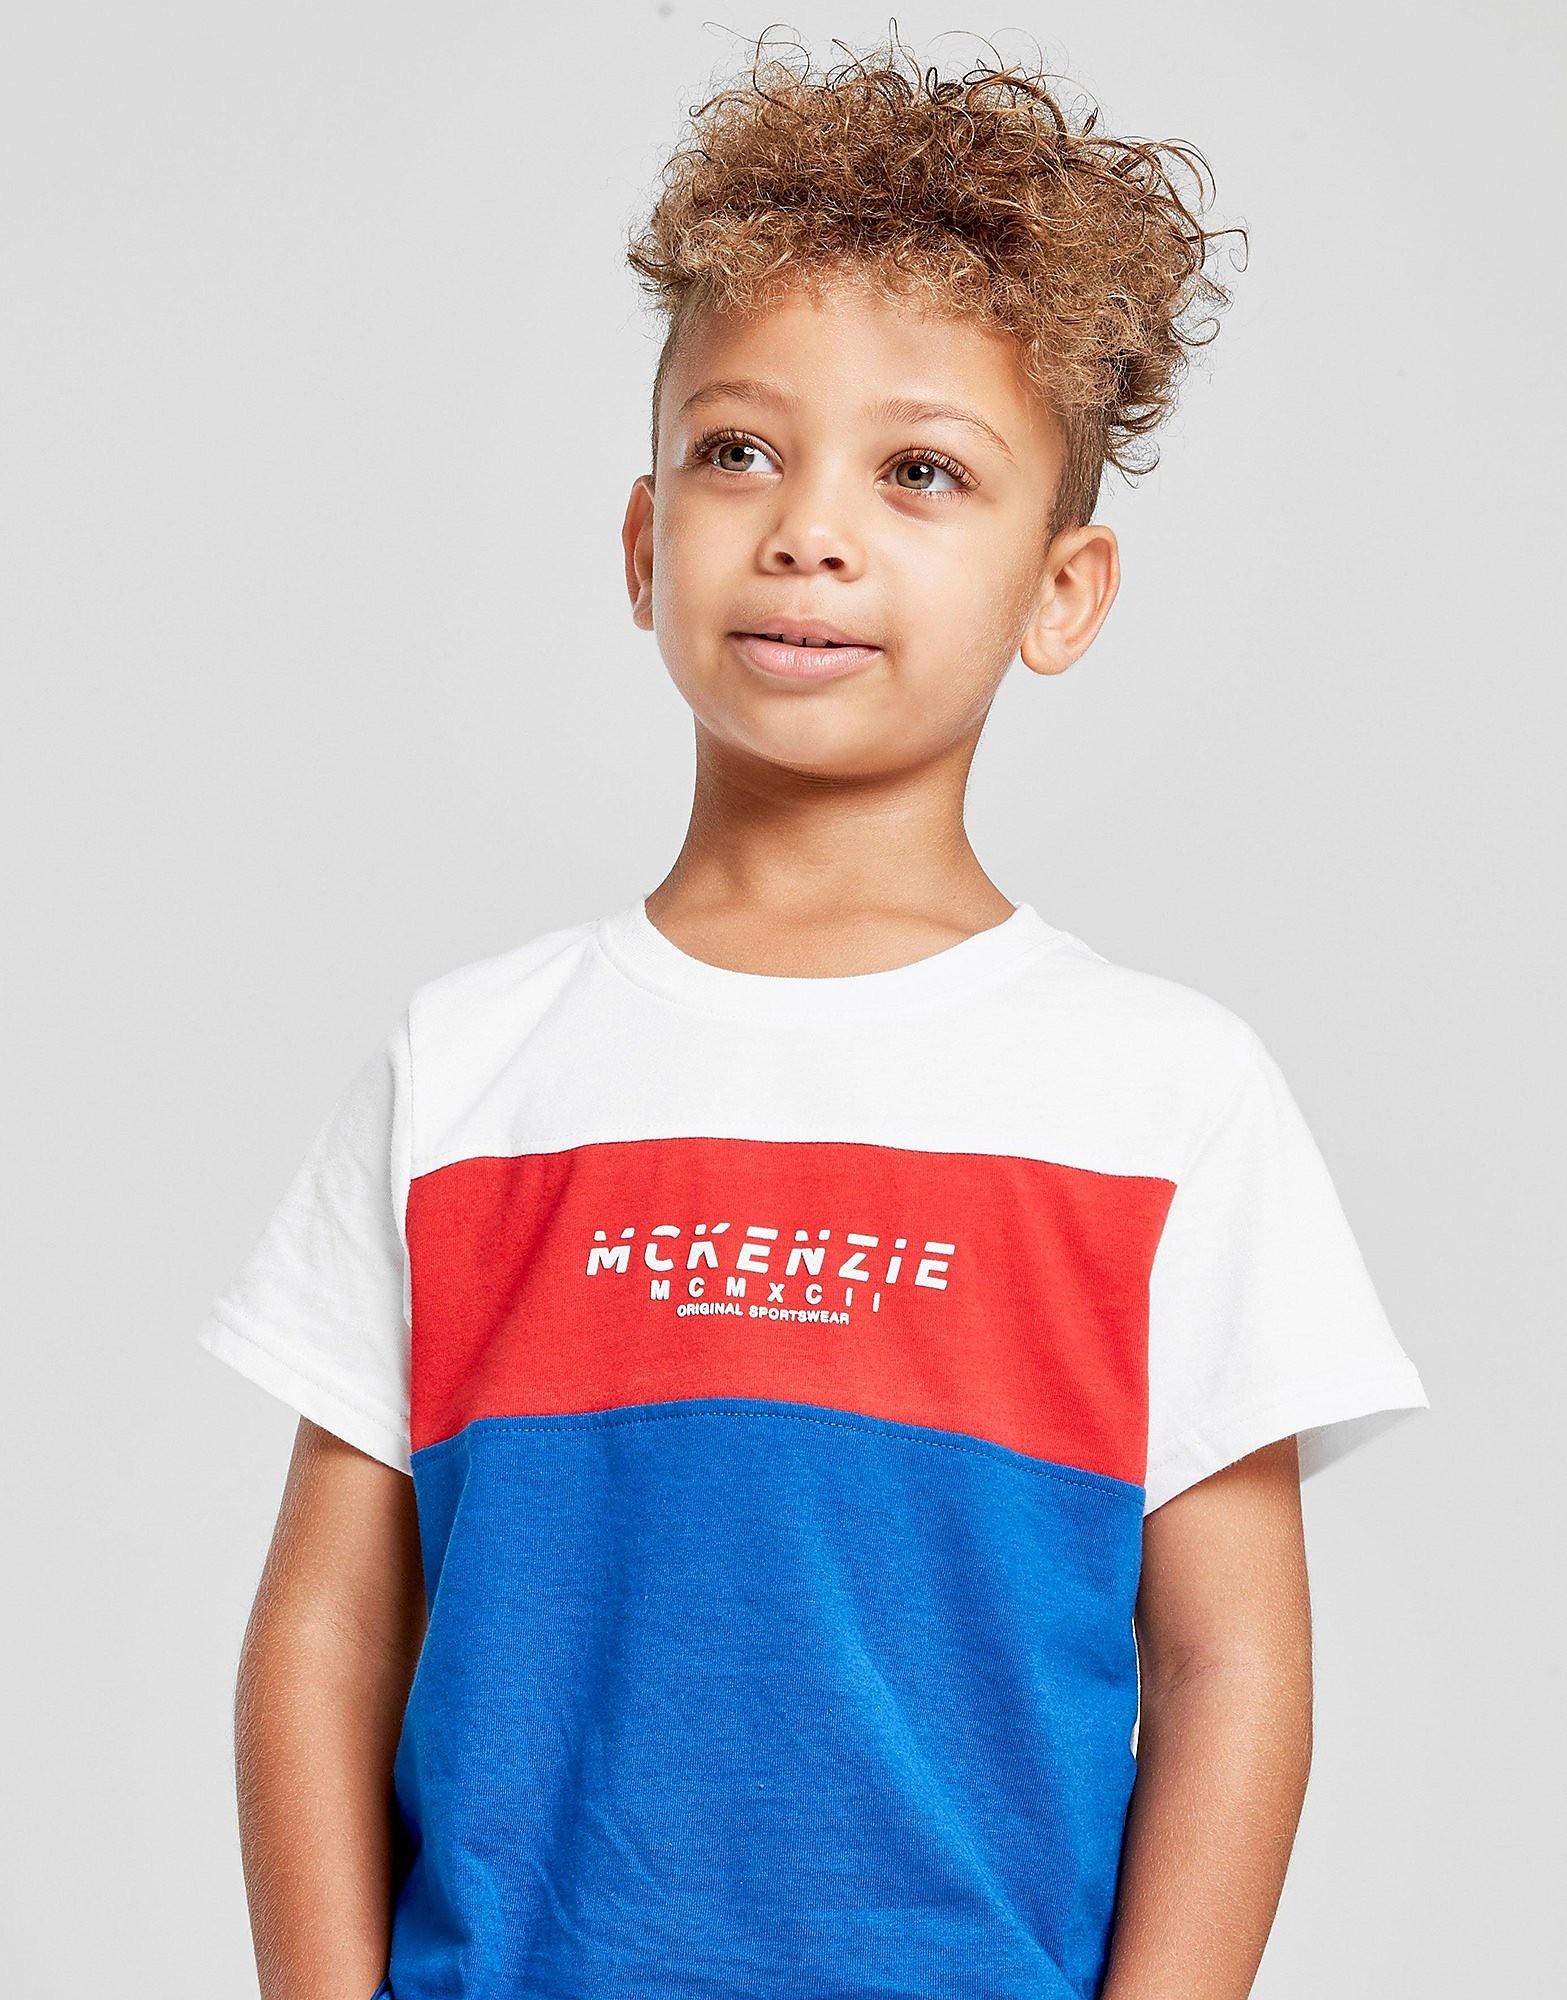 McKenzie Mini Mixon 2 T-Shirt Children - alleen bij JD - Blauw - Kind